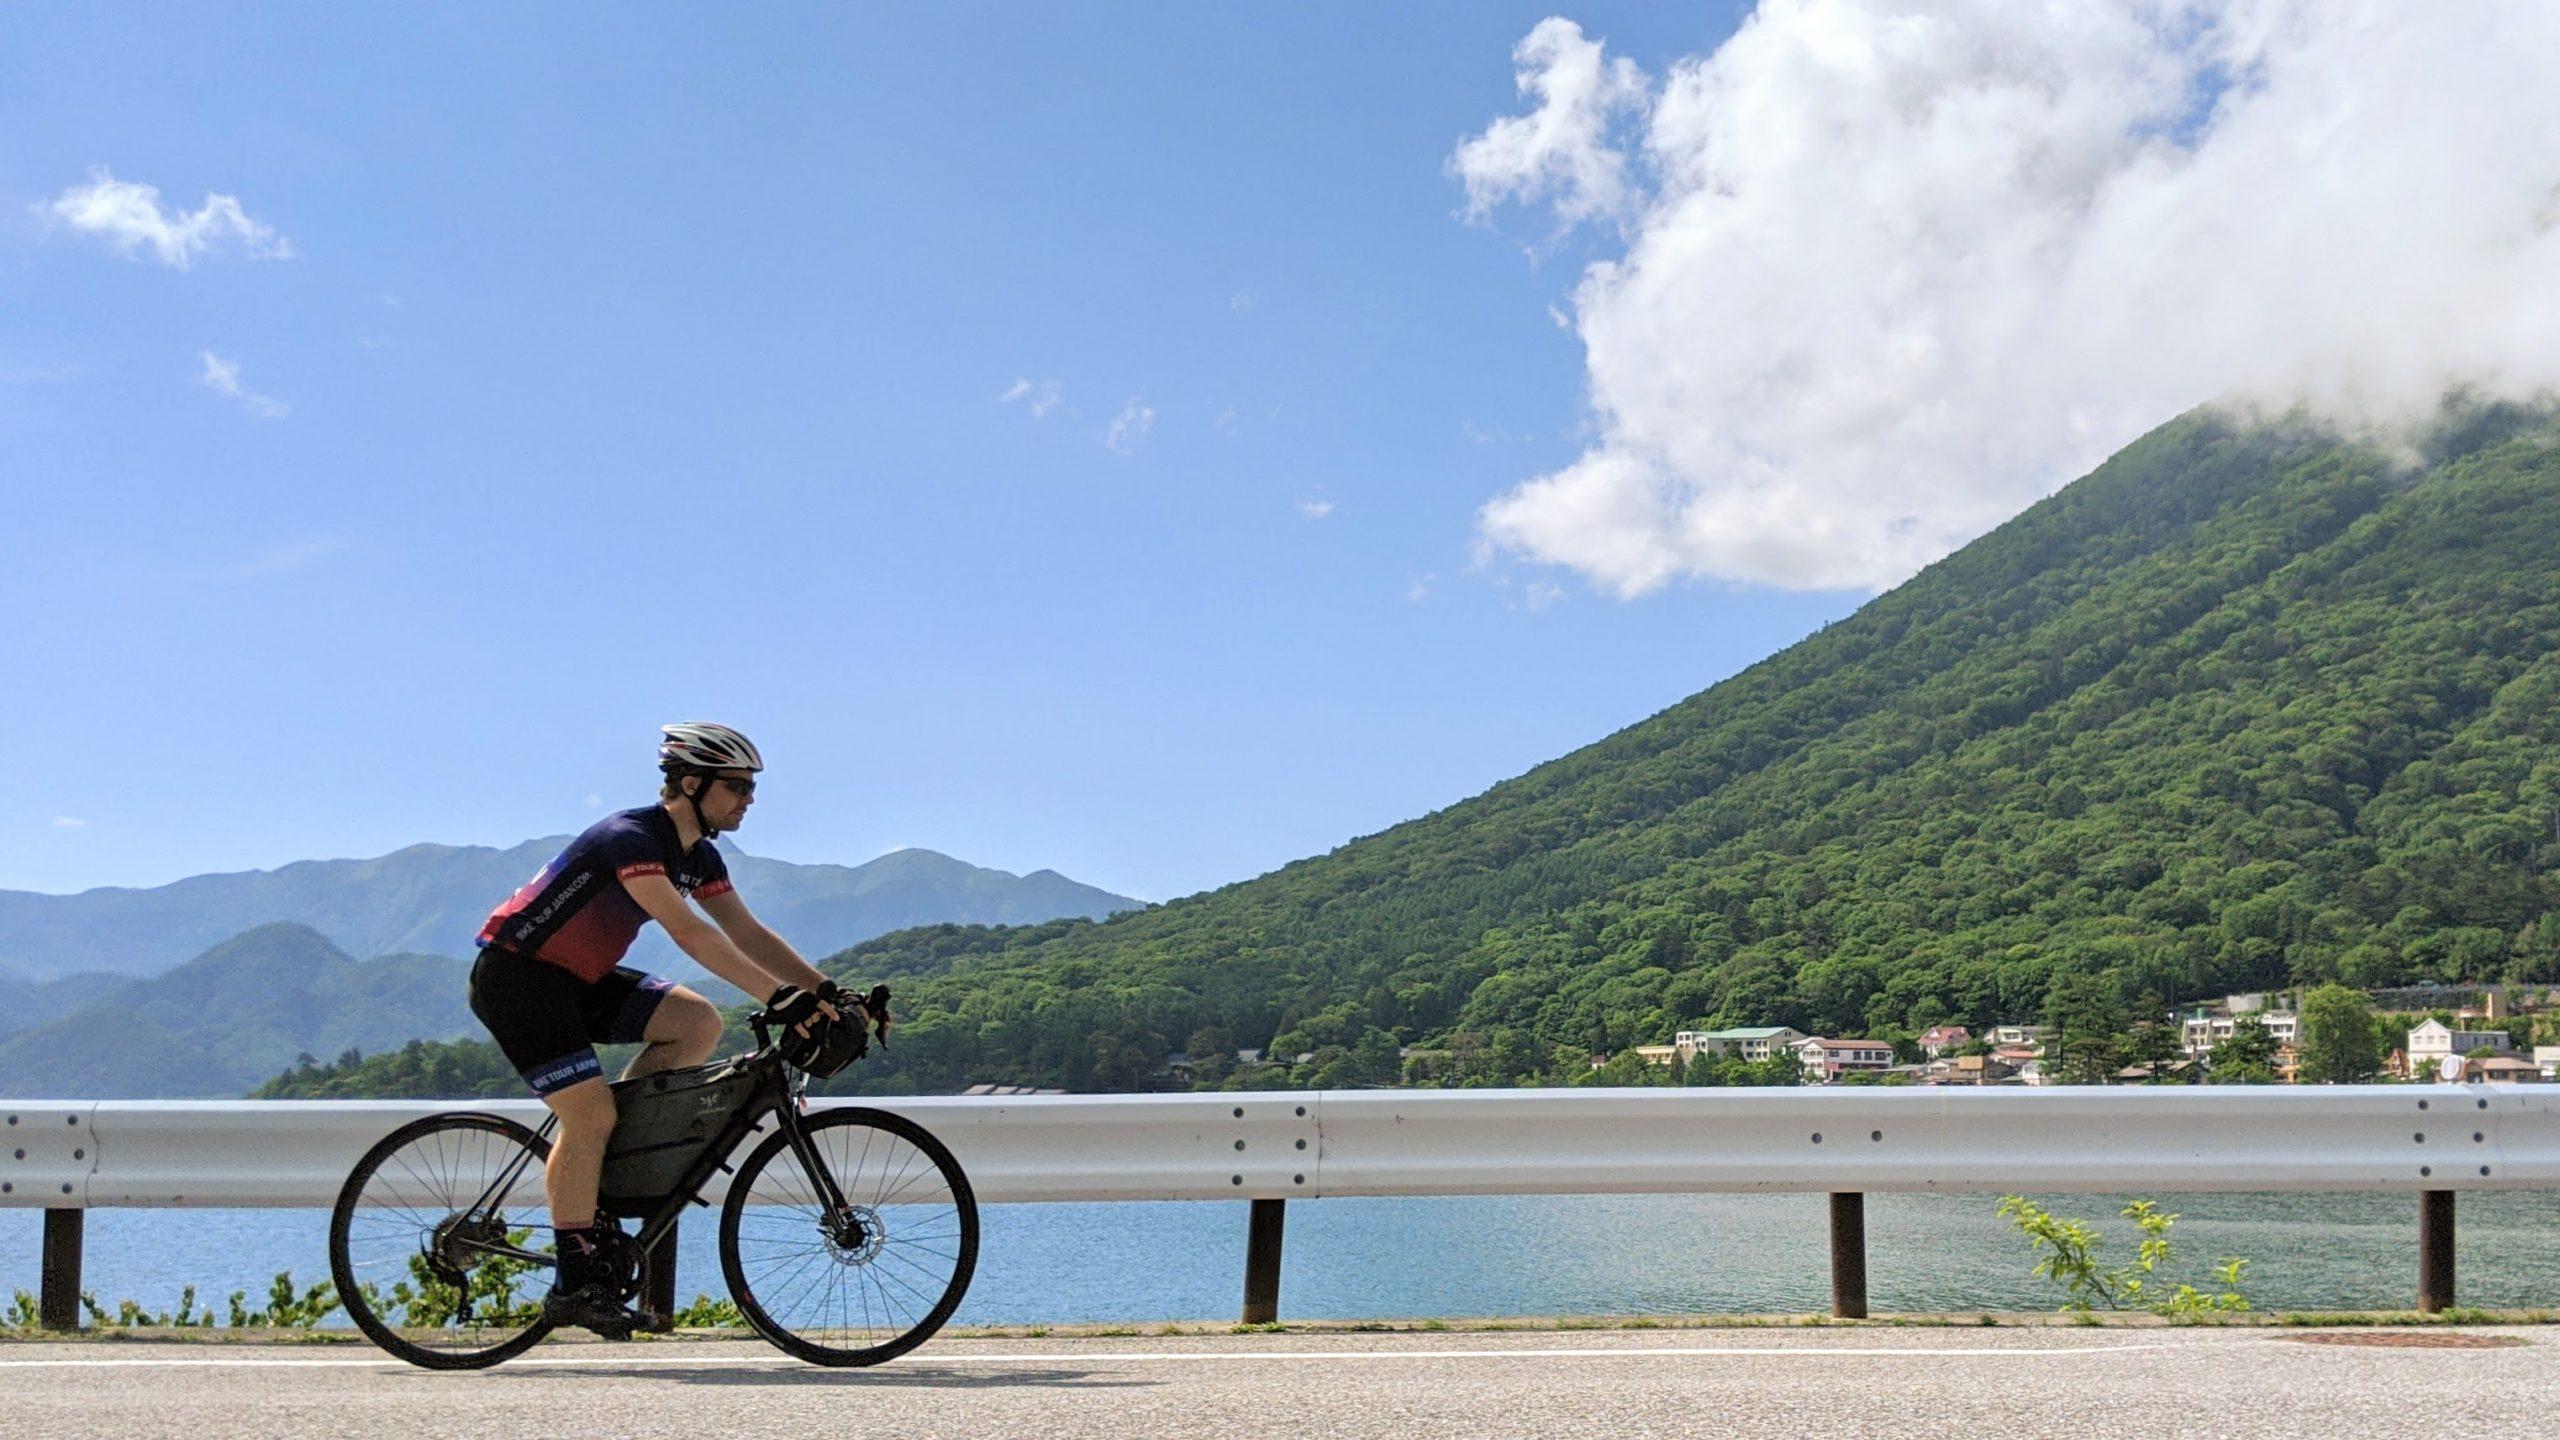 Riding the shores of Lake Chuzenji by the slopes of Mt Nantai.